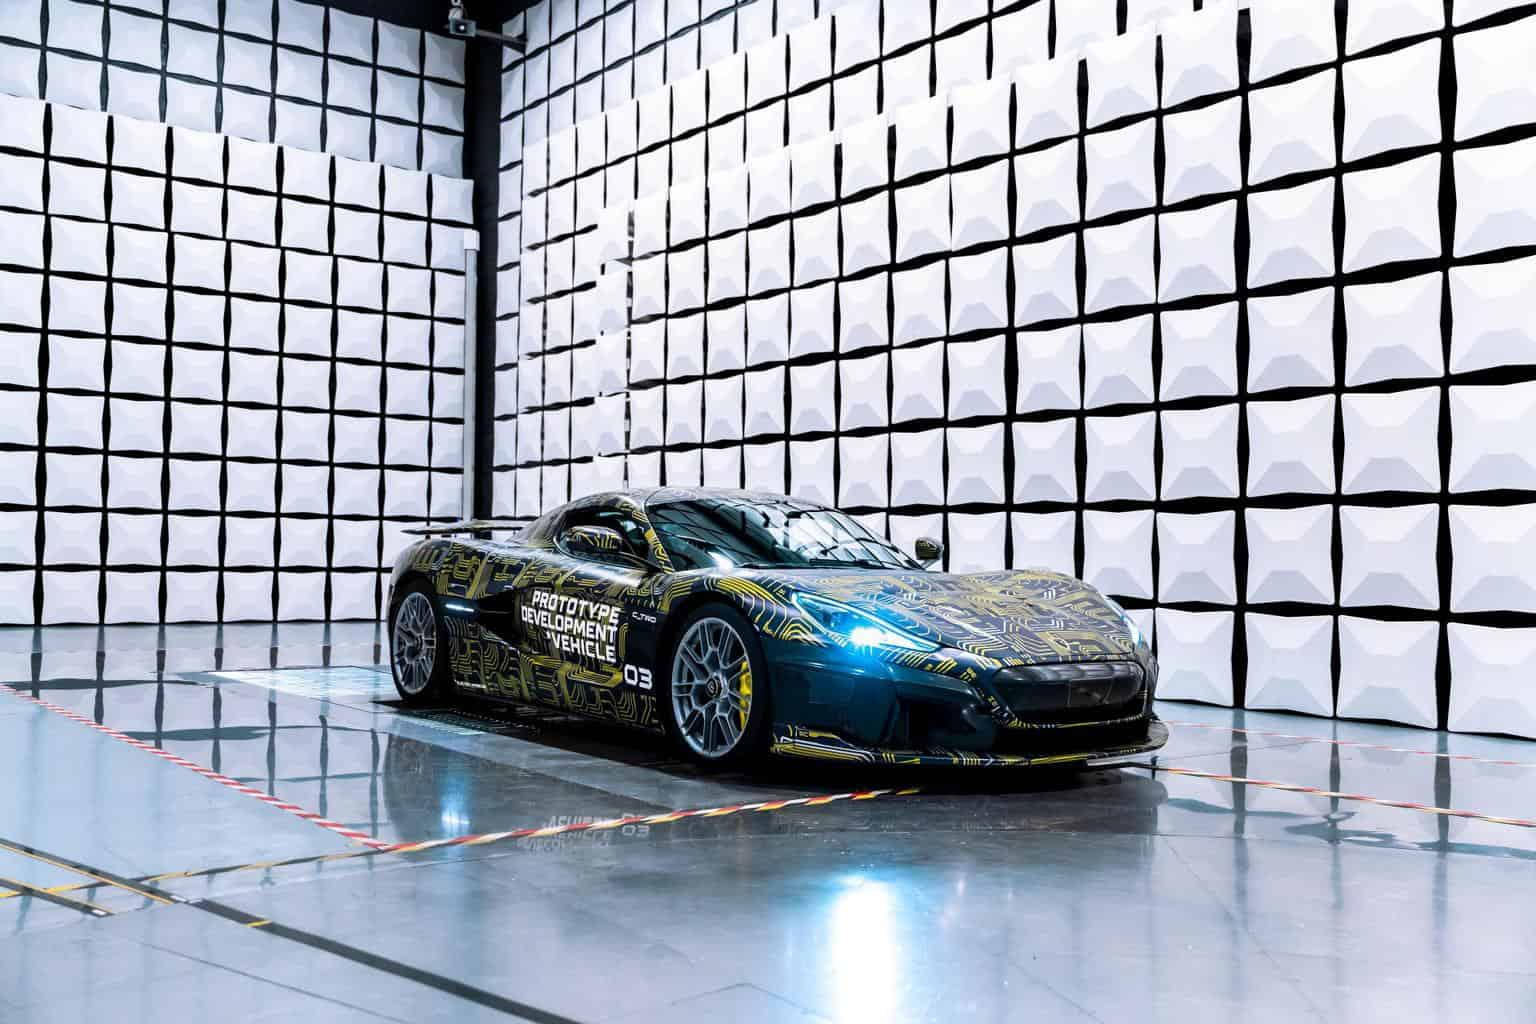 Rimac: Erste Jahresproduktion des E-Hypercars C_Two bereits ausverkauft